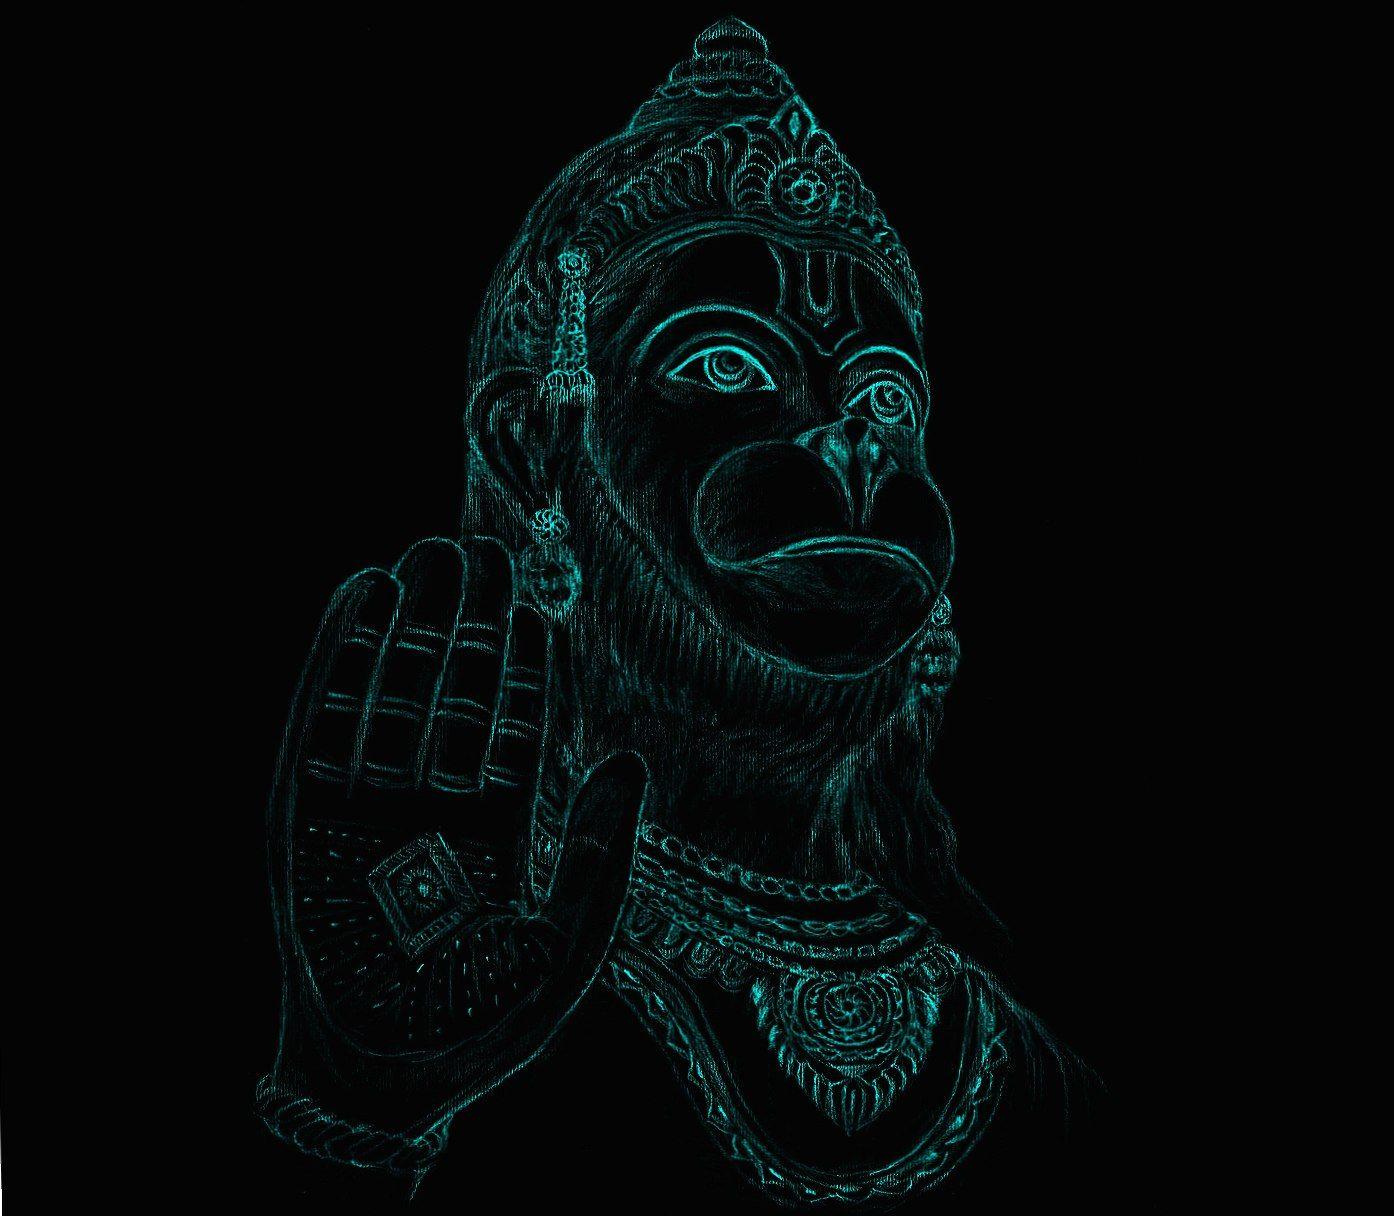 Neon Hanuman Wallpapers Hd Hanuman Wallpaper Hanuman Animated Cartoons